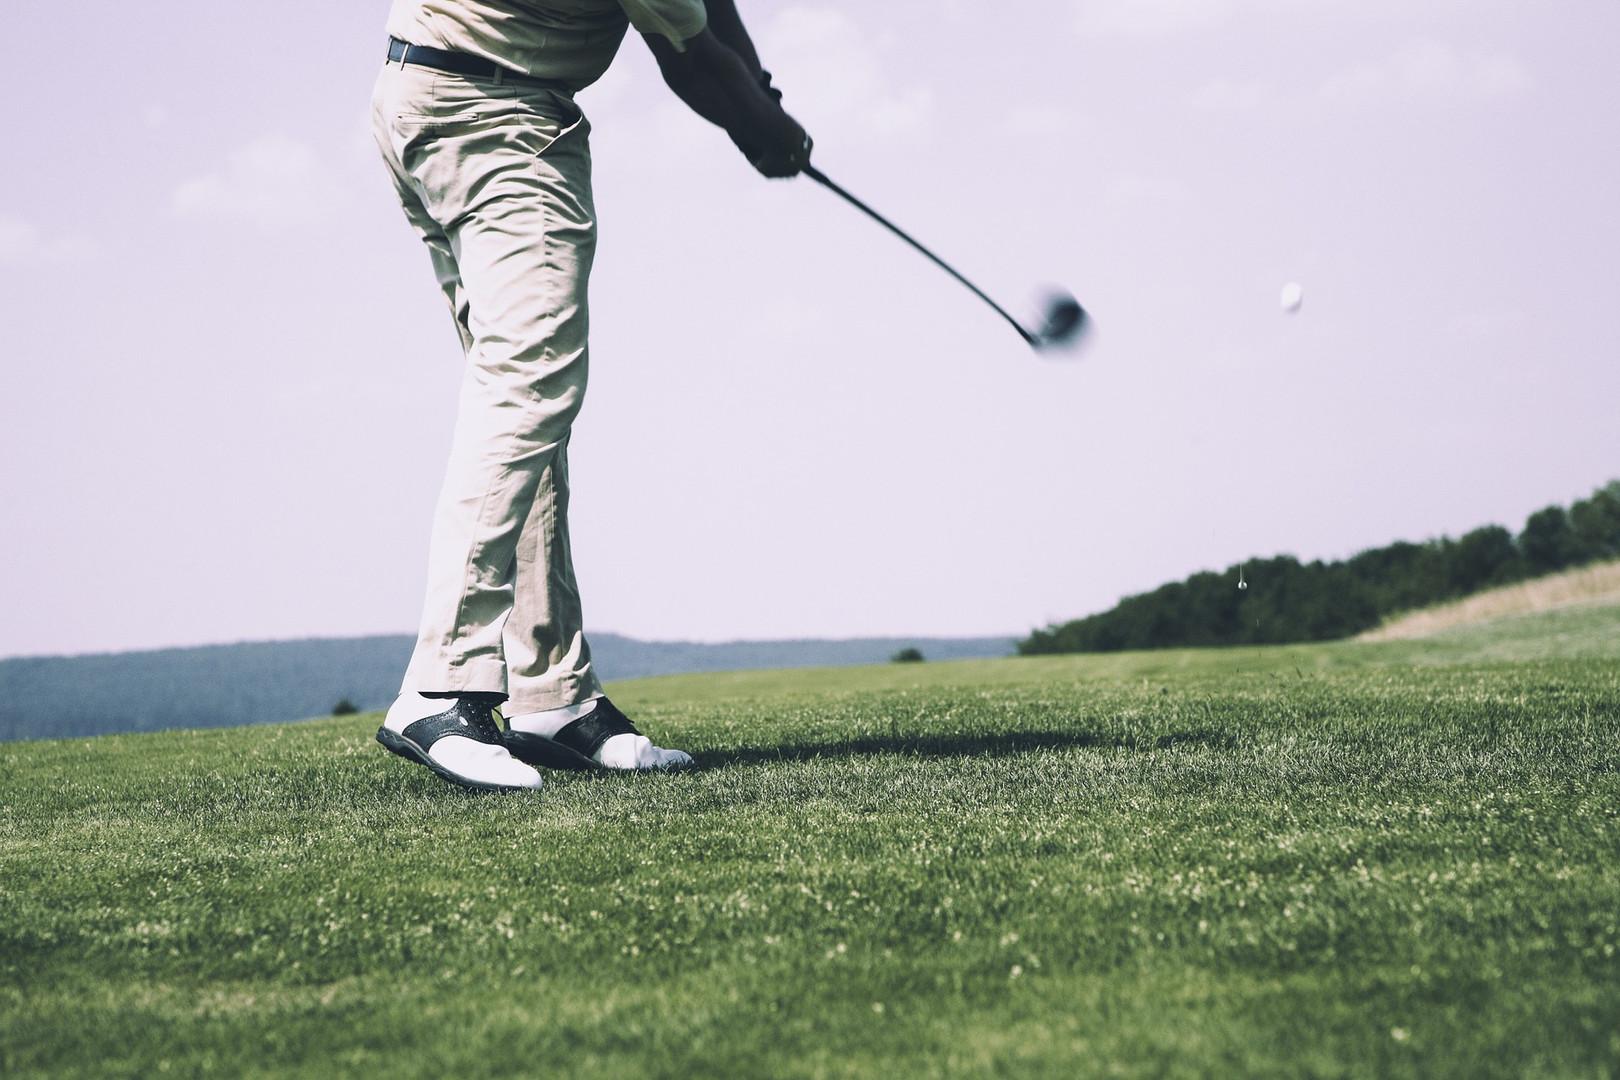 golf-1486354_1920.jpg